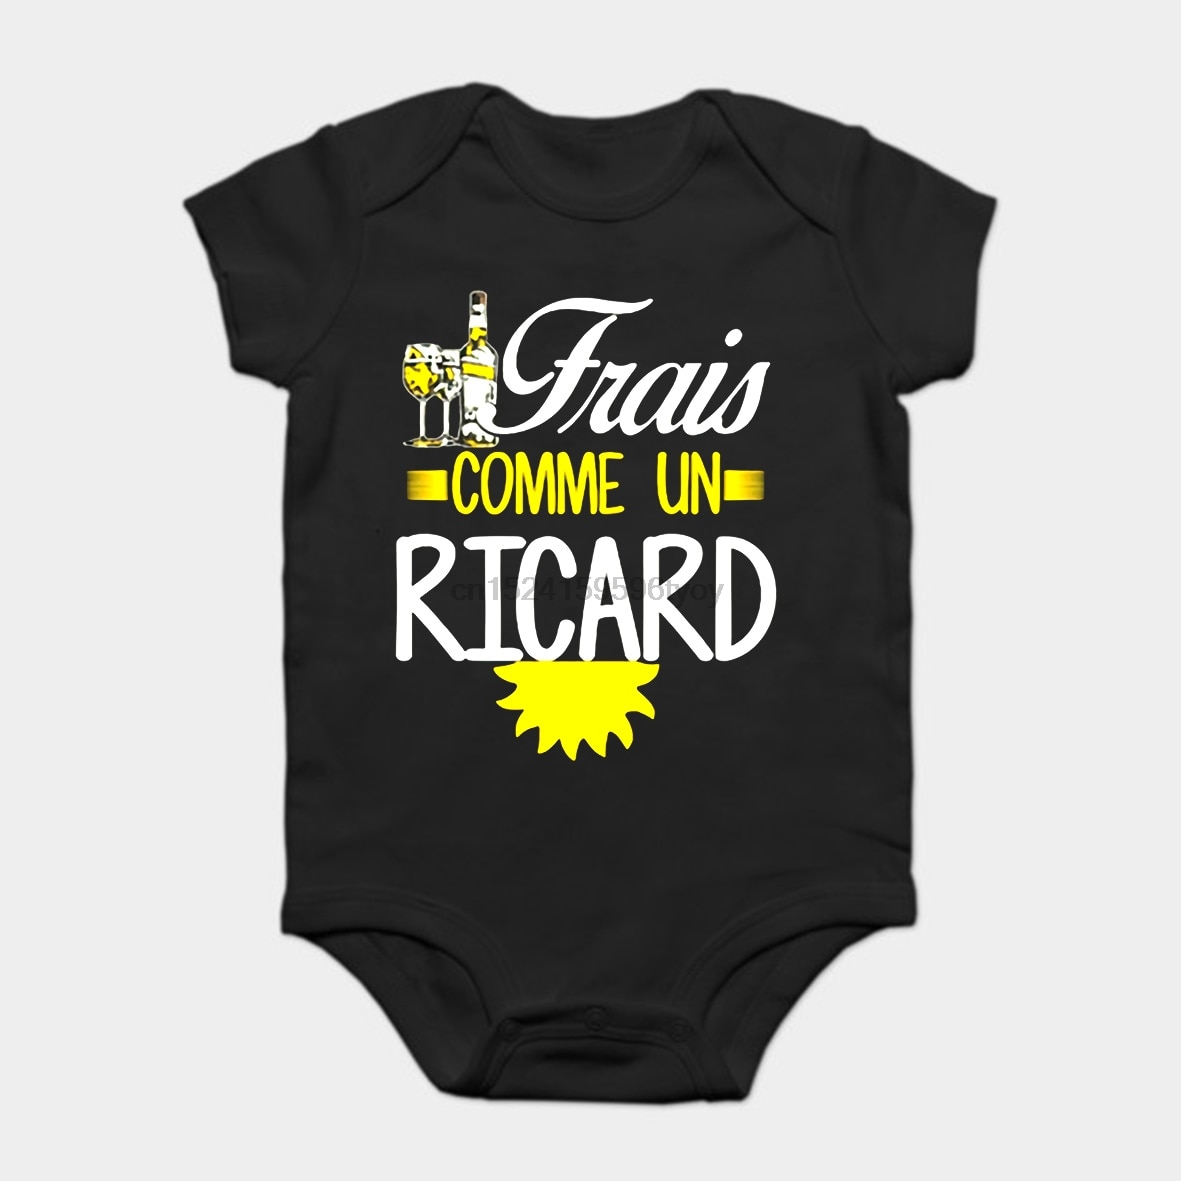 Pelele de bebé pelele chico Camiseta Hombre Frais Comme Un Ricard Camiseta de algodón S-3xl